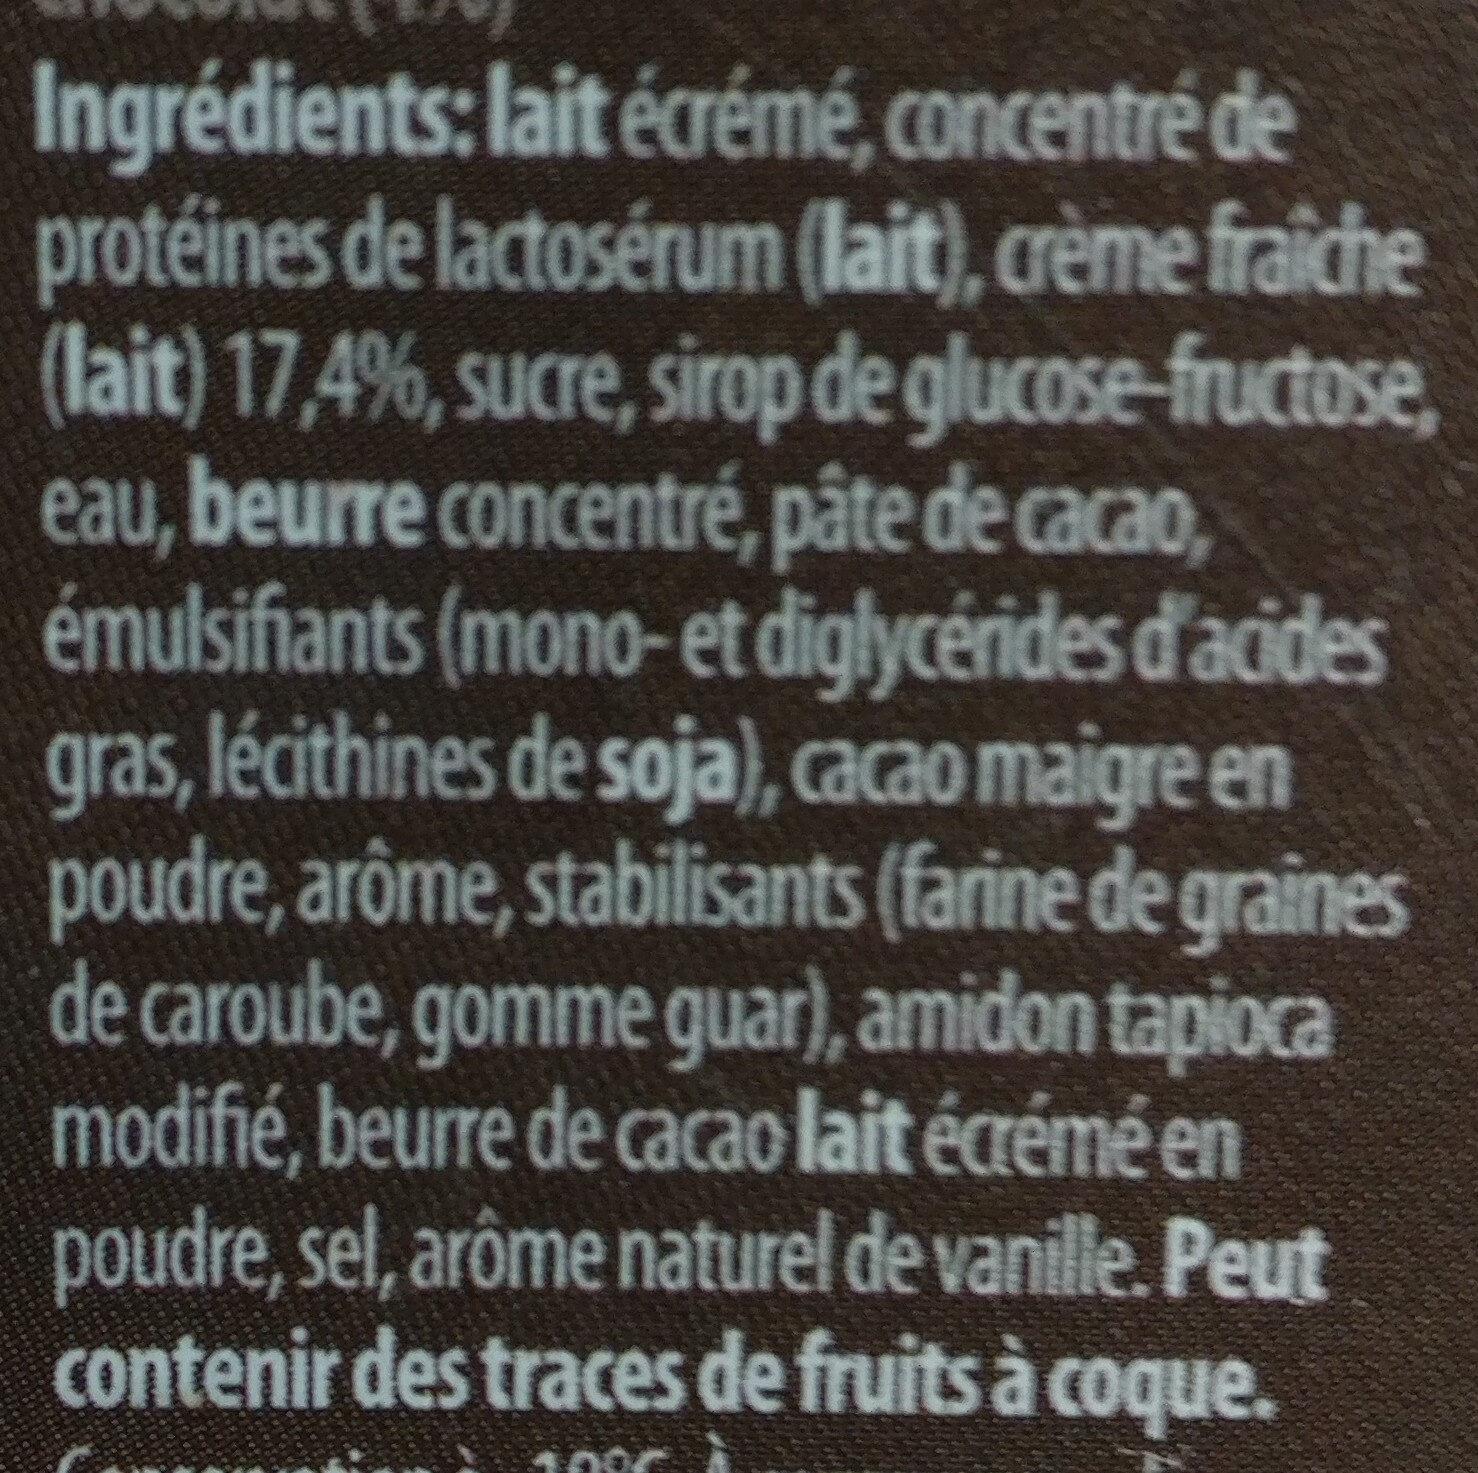 Stracciatella - Ingredients